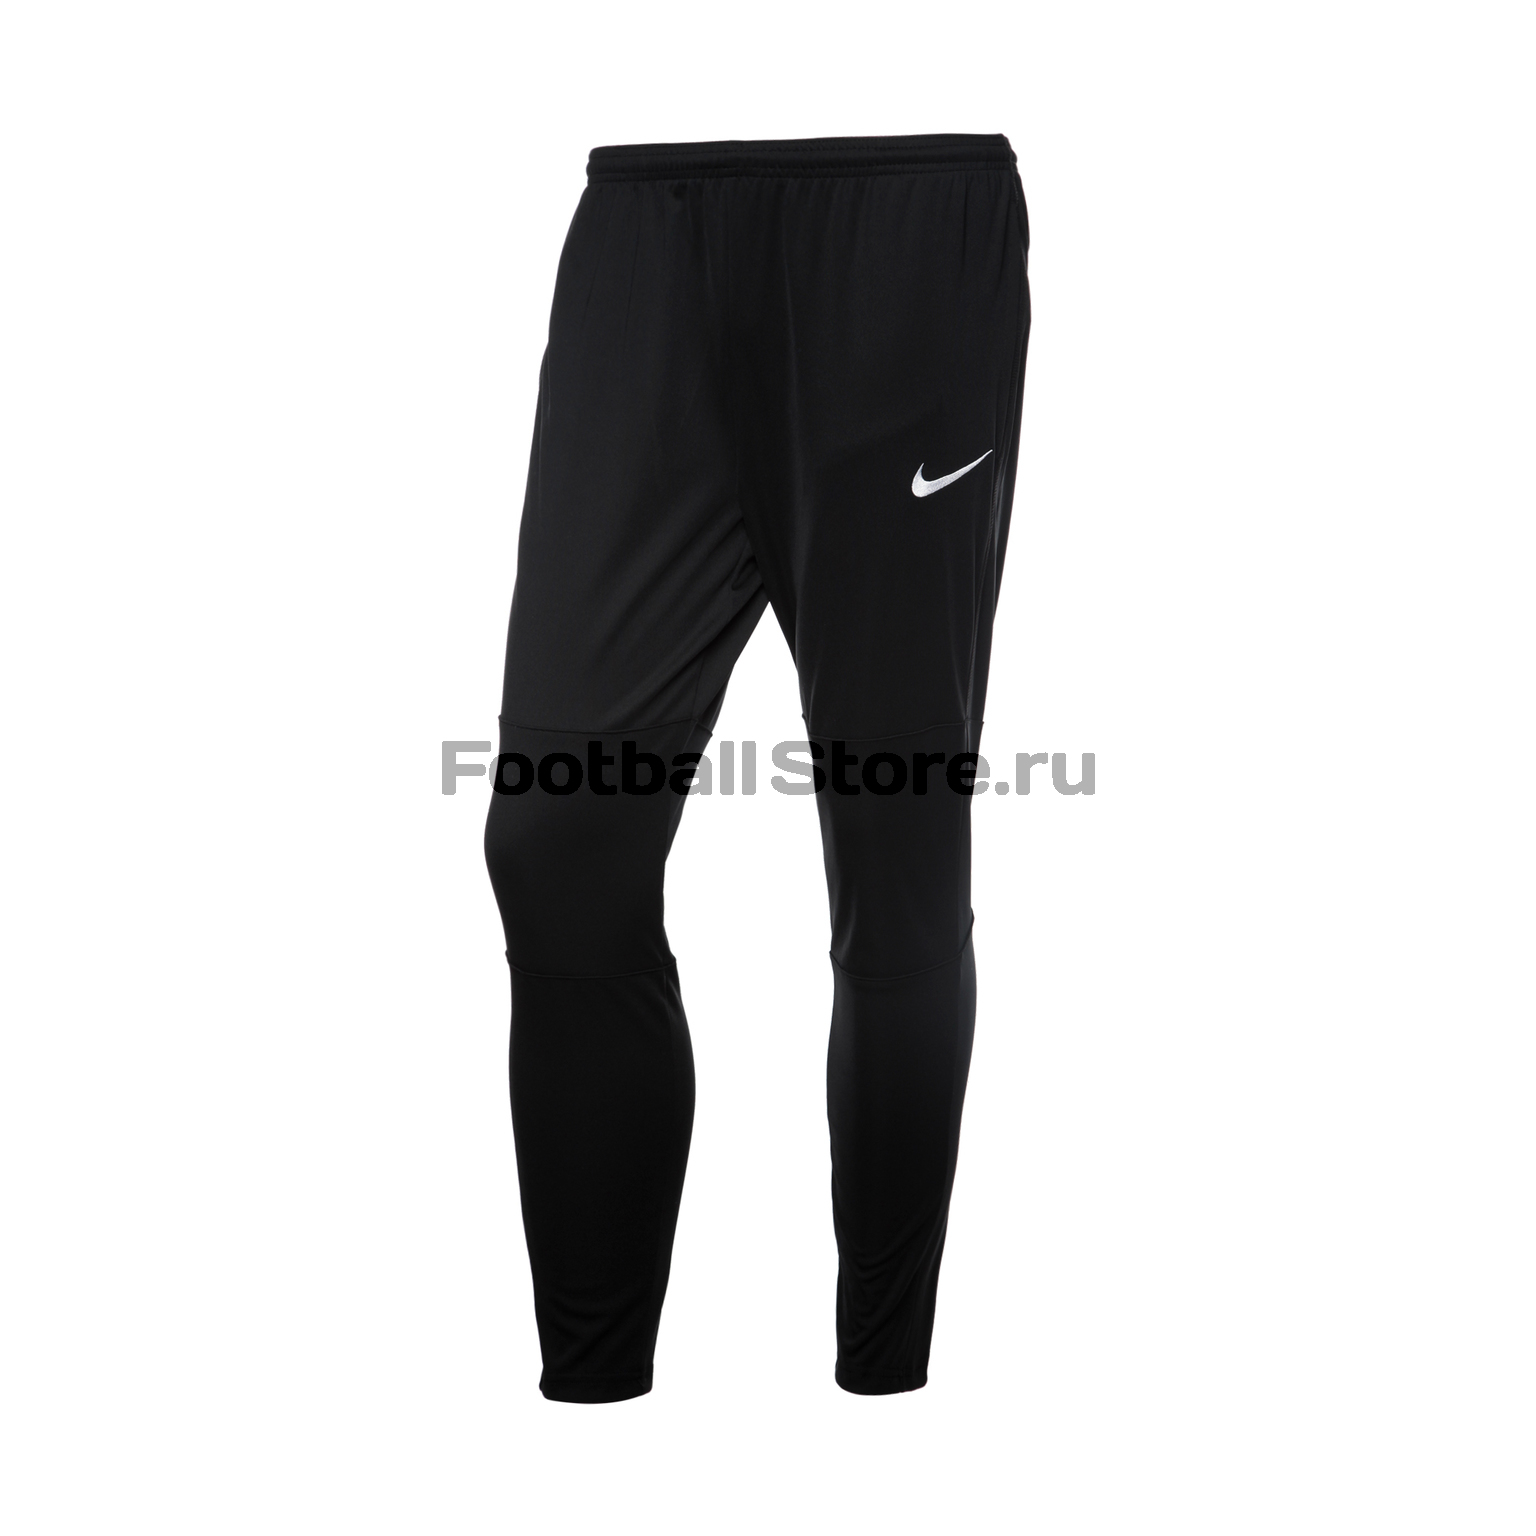 Фото - Брюки тренировочные Nike Dry Park18 Pant AA2086-010 куртка ветрозащитная nike dry park18 rn jkt aa2090 010 sr